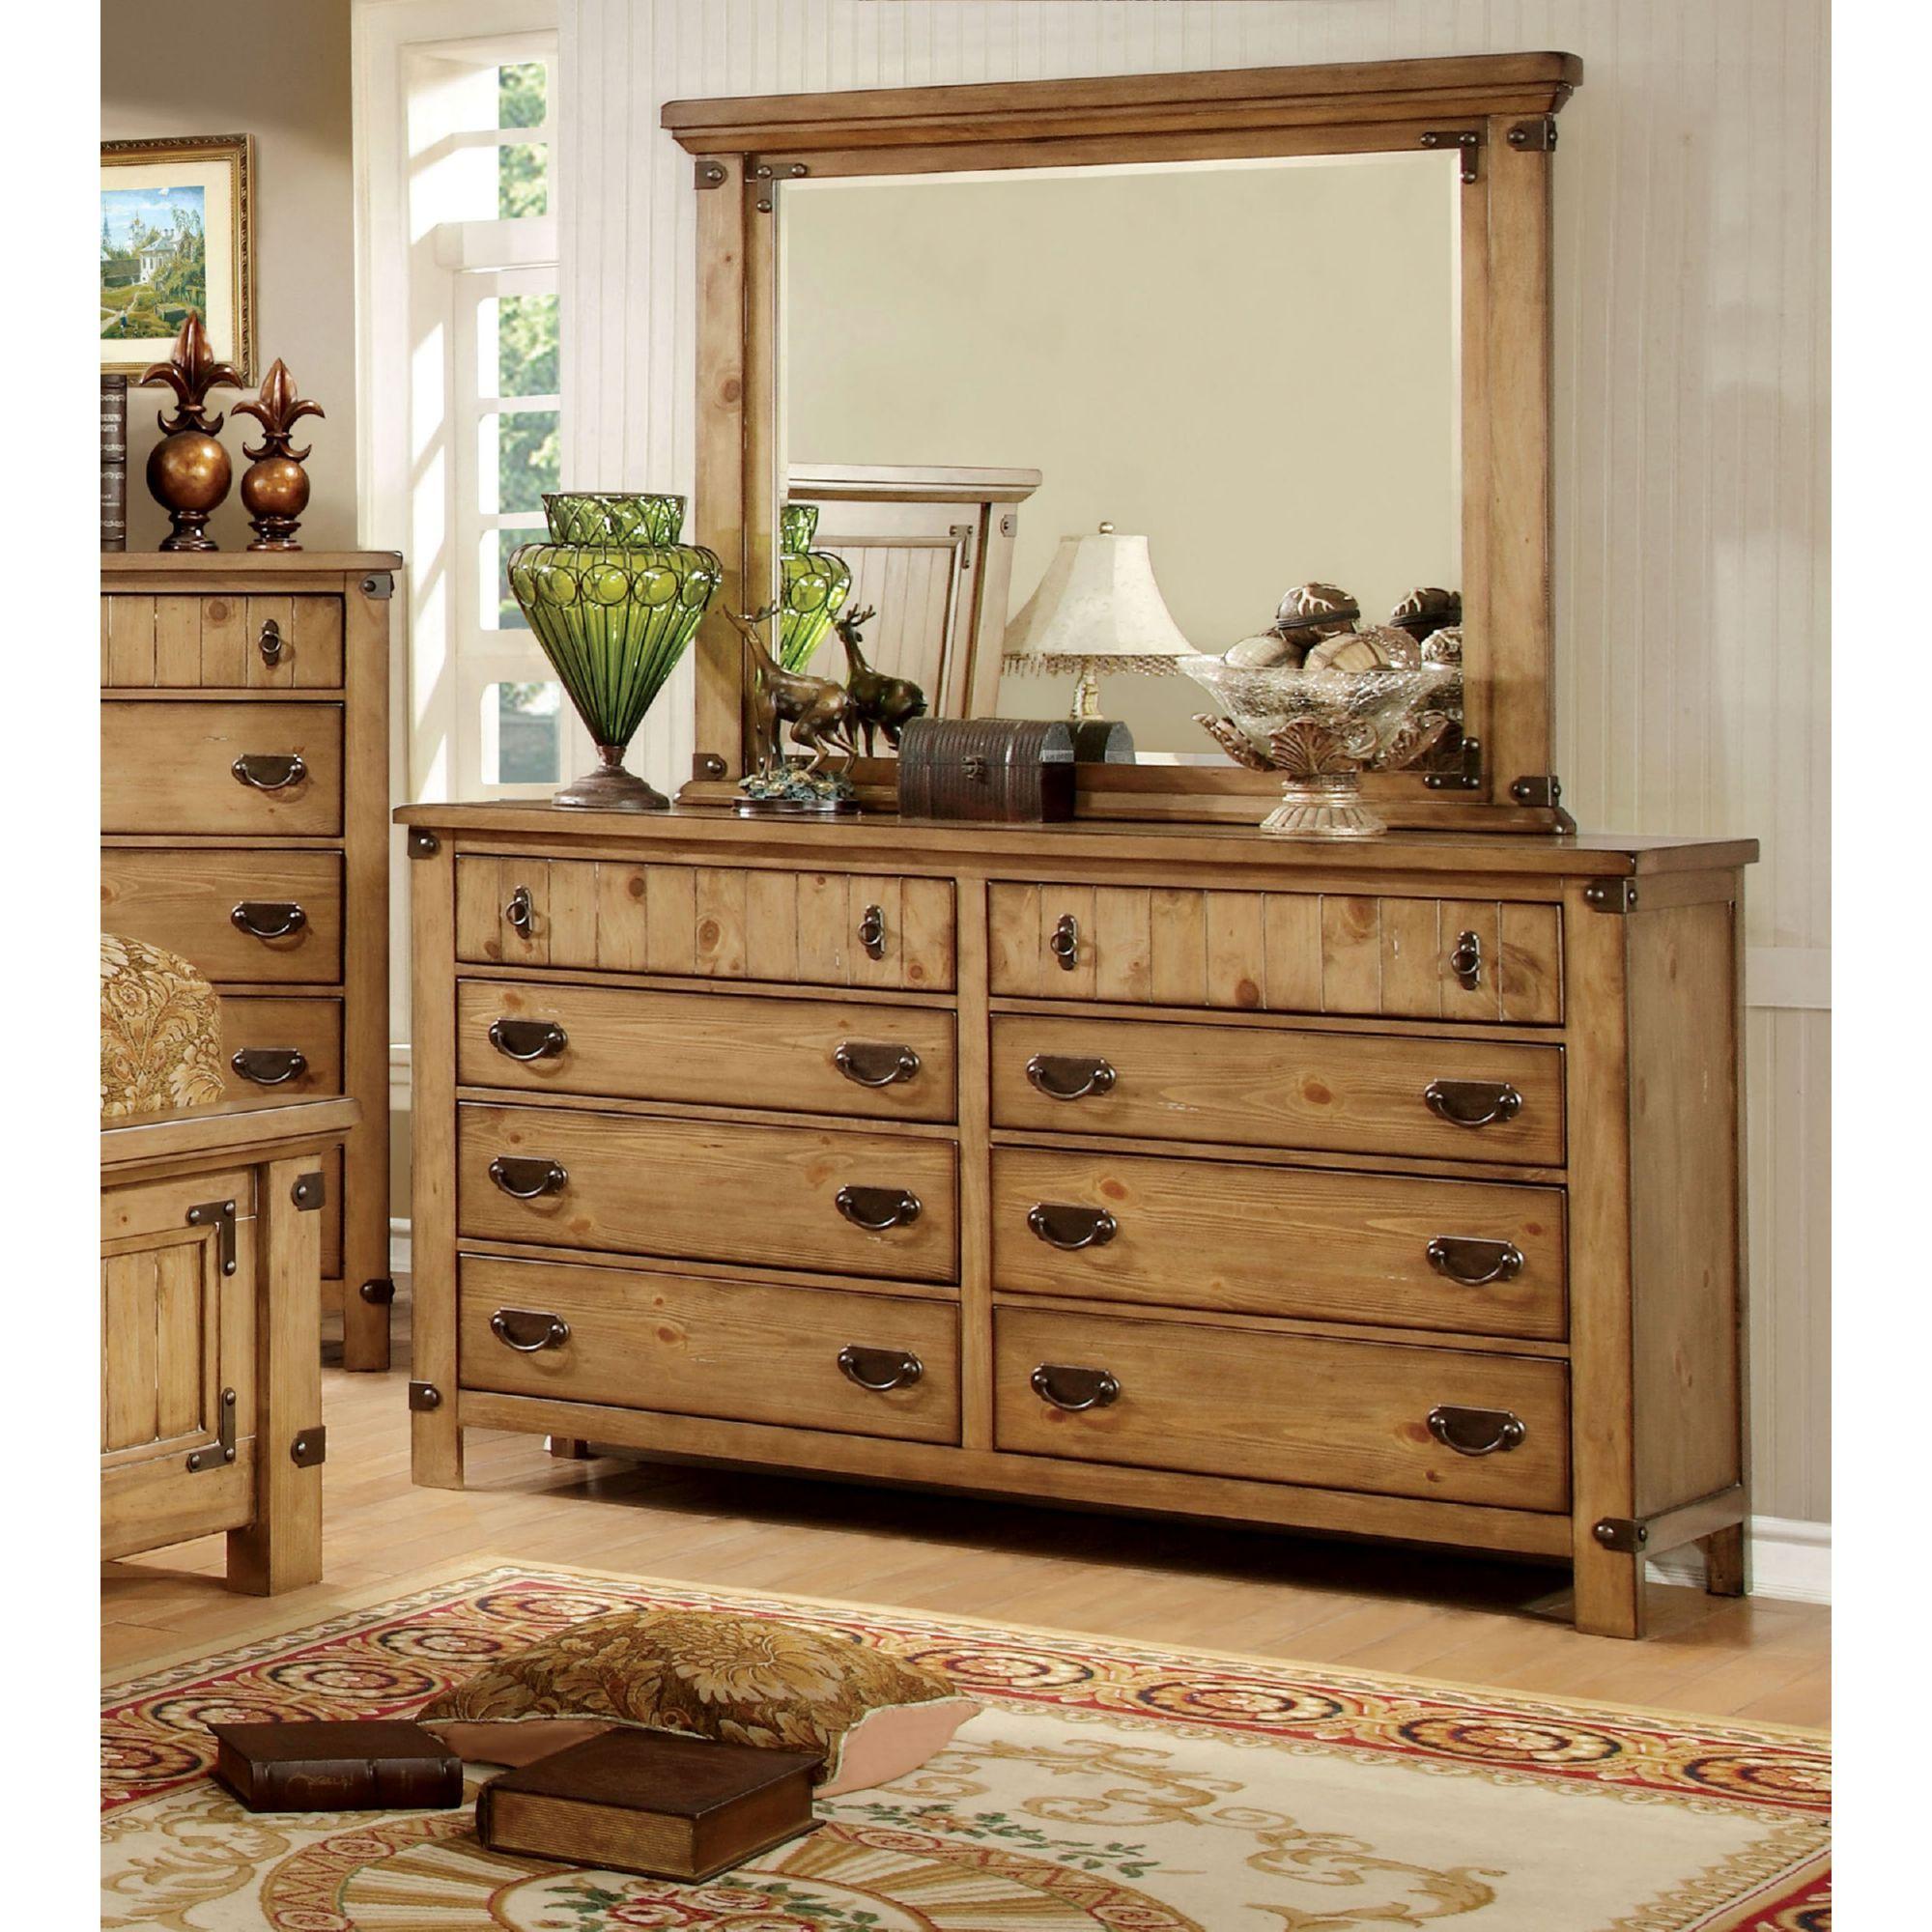 Rockwell rustic wood accent dresser u mirror set in weathered elm